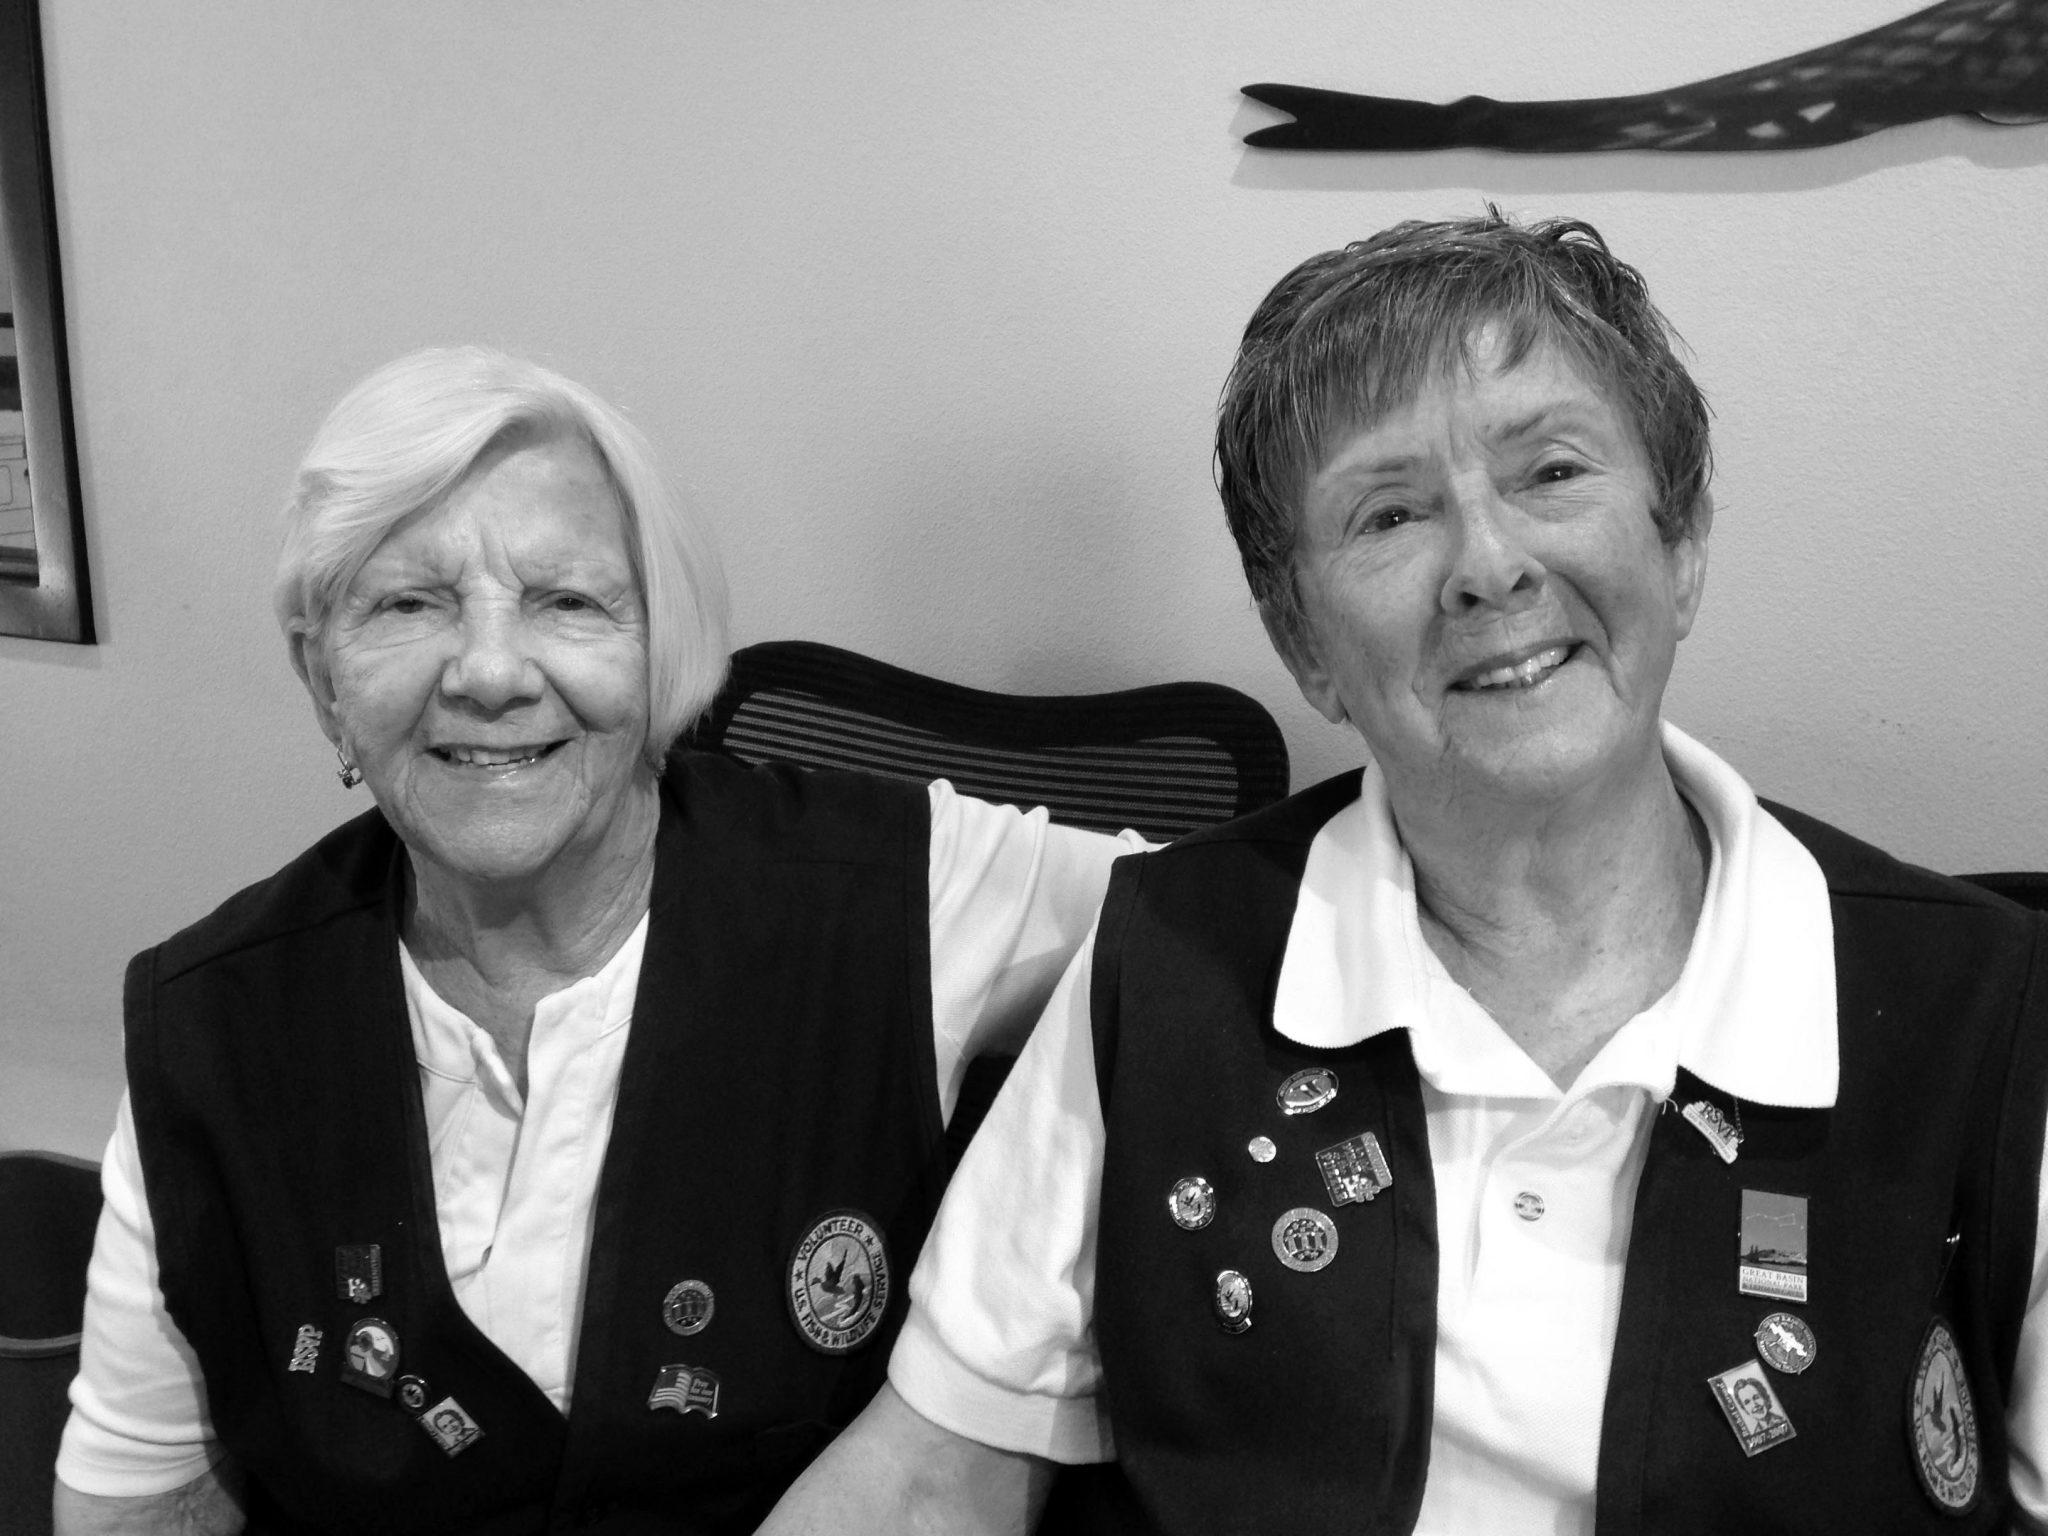 Wildlife Refuge Volunteers to Retire After 10 Years of Service